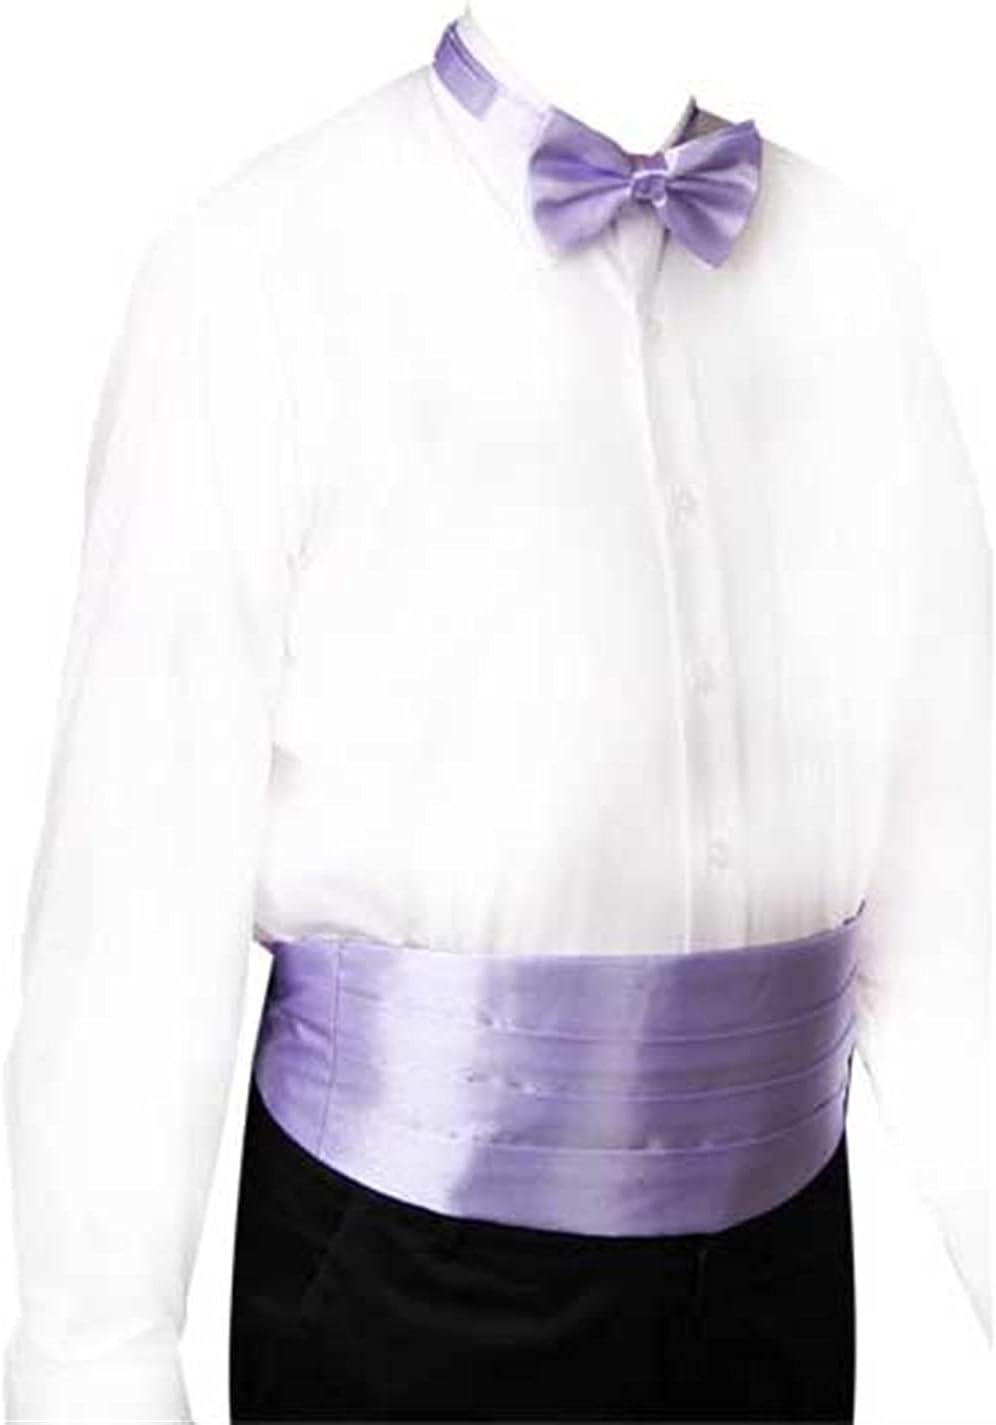 JJZXC Gentleman Solid Wide Silk Satin Elastic Belly Band Tuxedo Cummerbund Commercial Banquet Model Business Elite (Color : A)